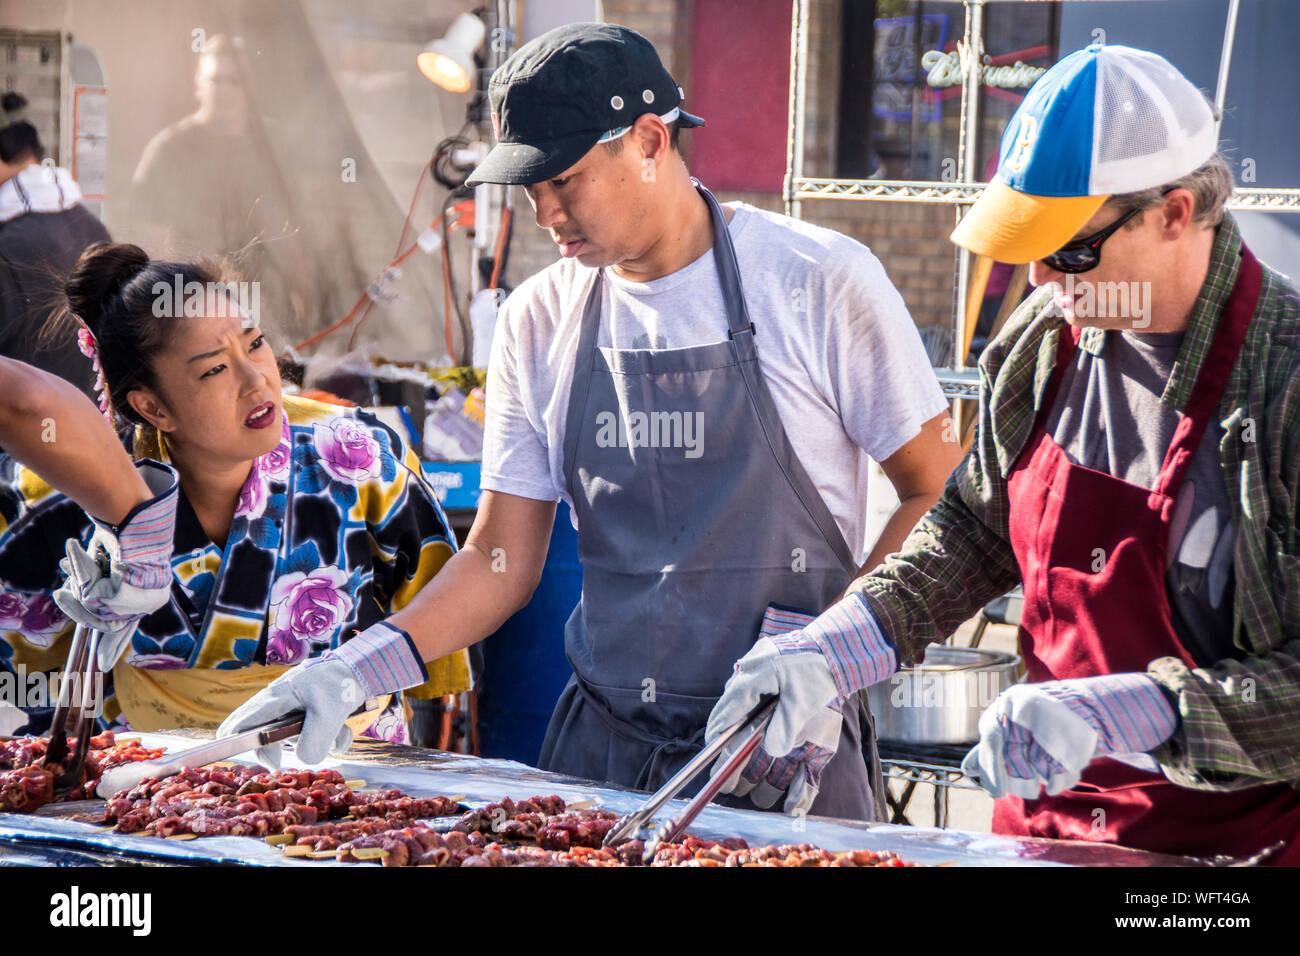 A group of volunteers cooking Korean food, at the Orange County International Food Fair. Stock Photo